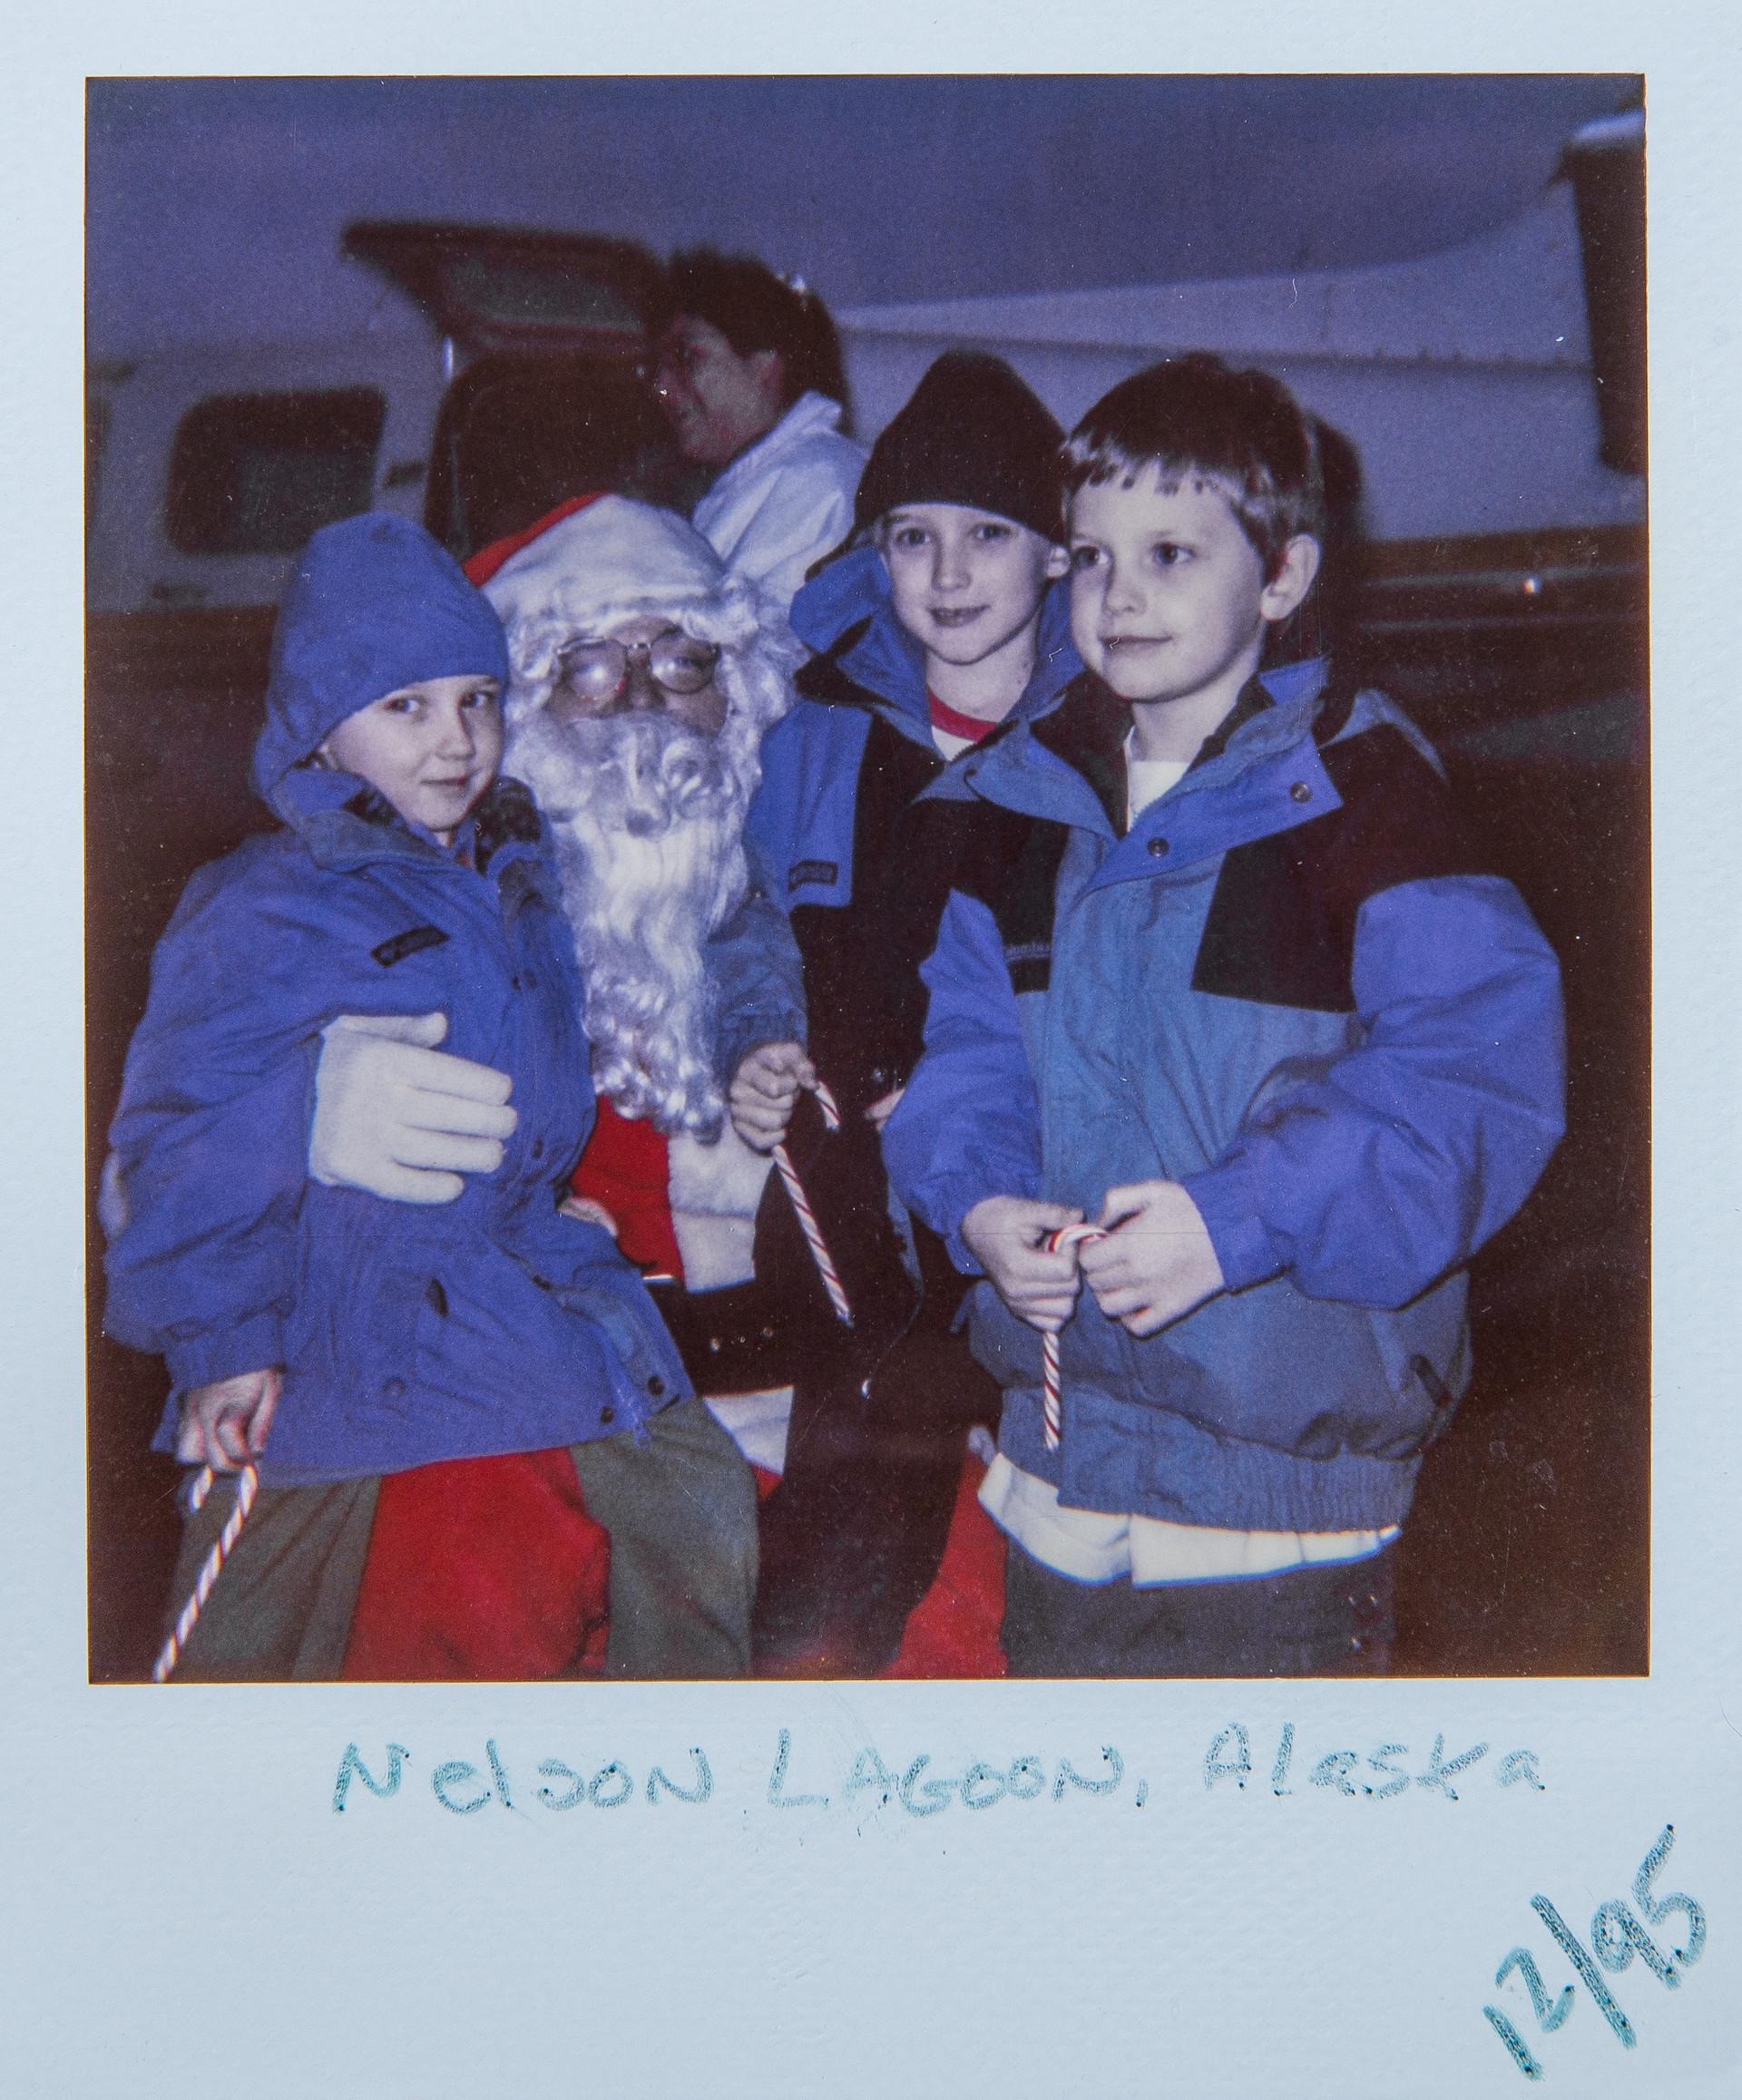 Ethan, Sutton, Everett Cook with Santa